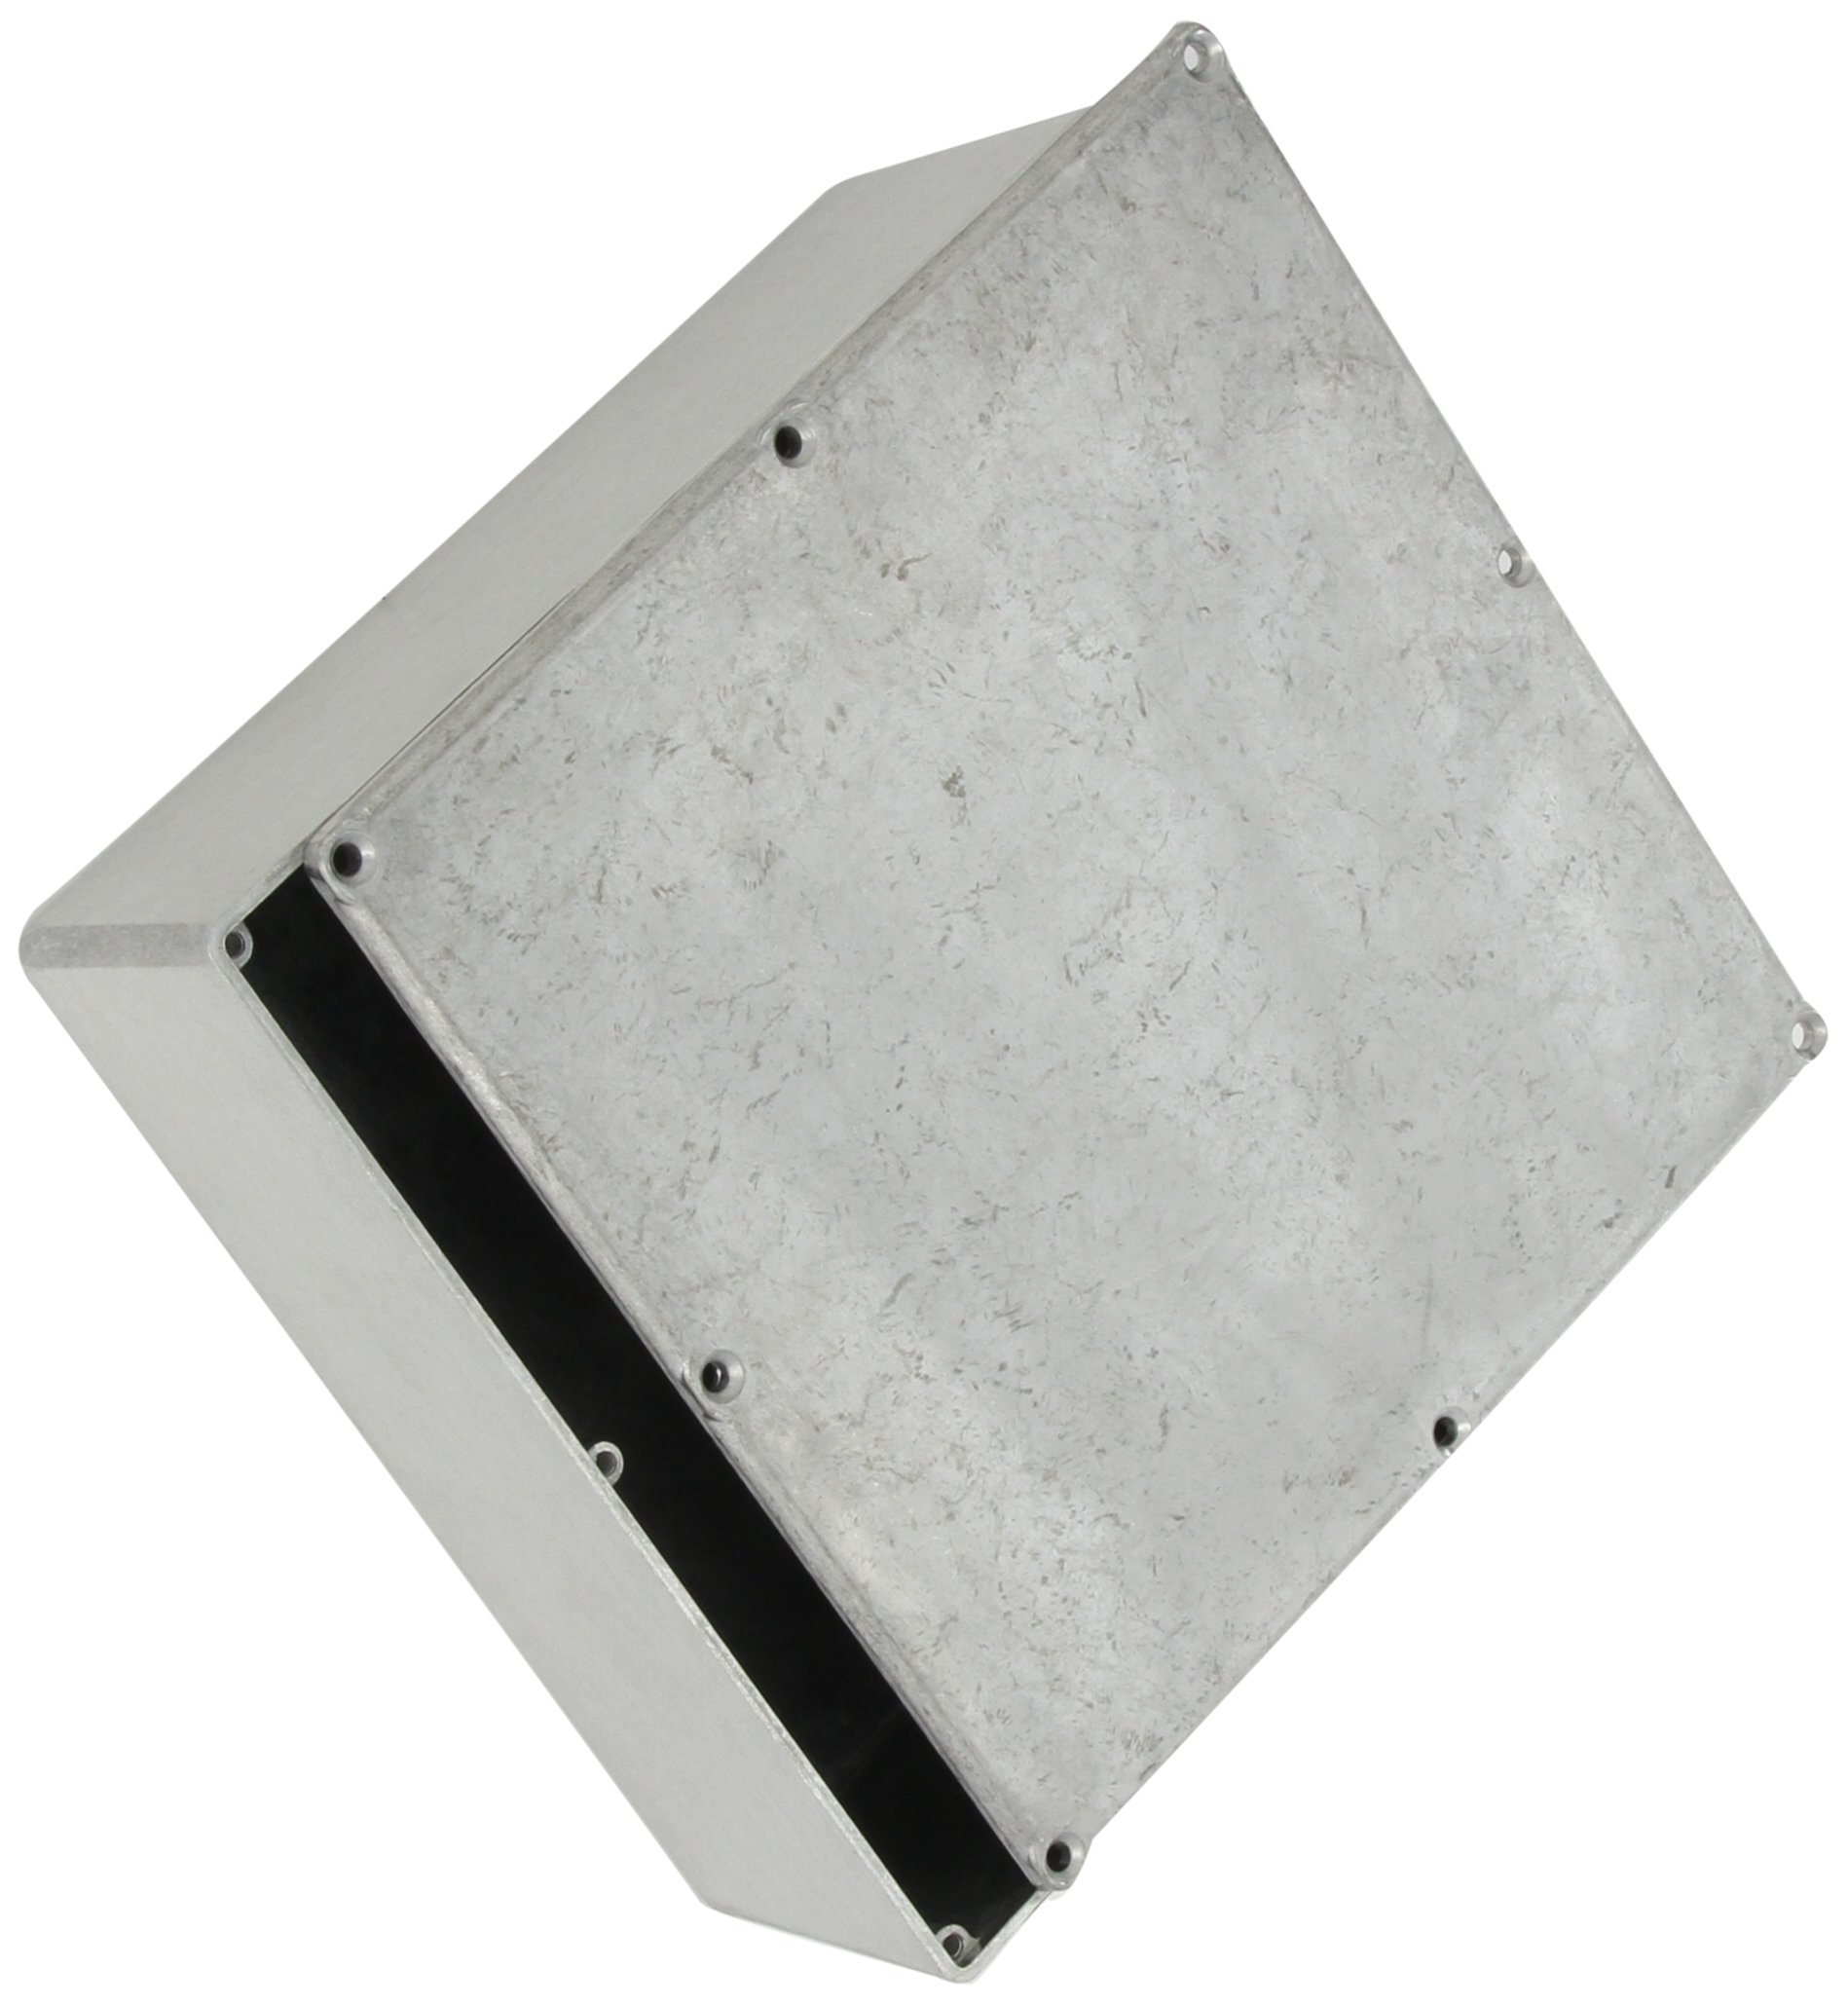 BUD Industries CU-478 Aluminum Econobox, 7-1/2'' Length x 7-1/2'' Width x 2-39/64'' Height, Natural Finish